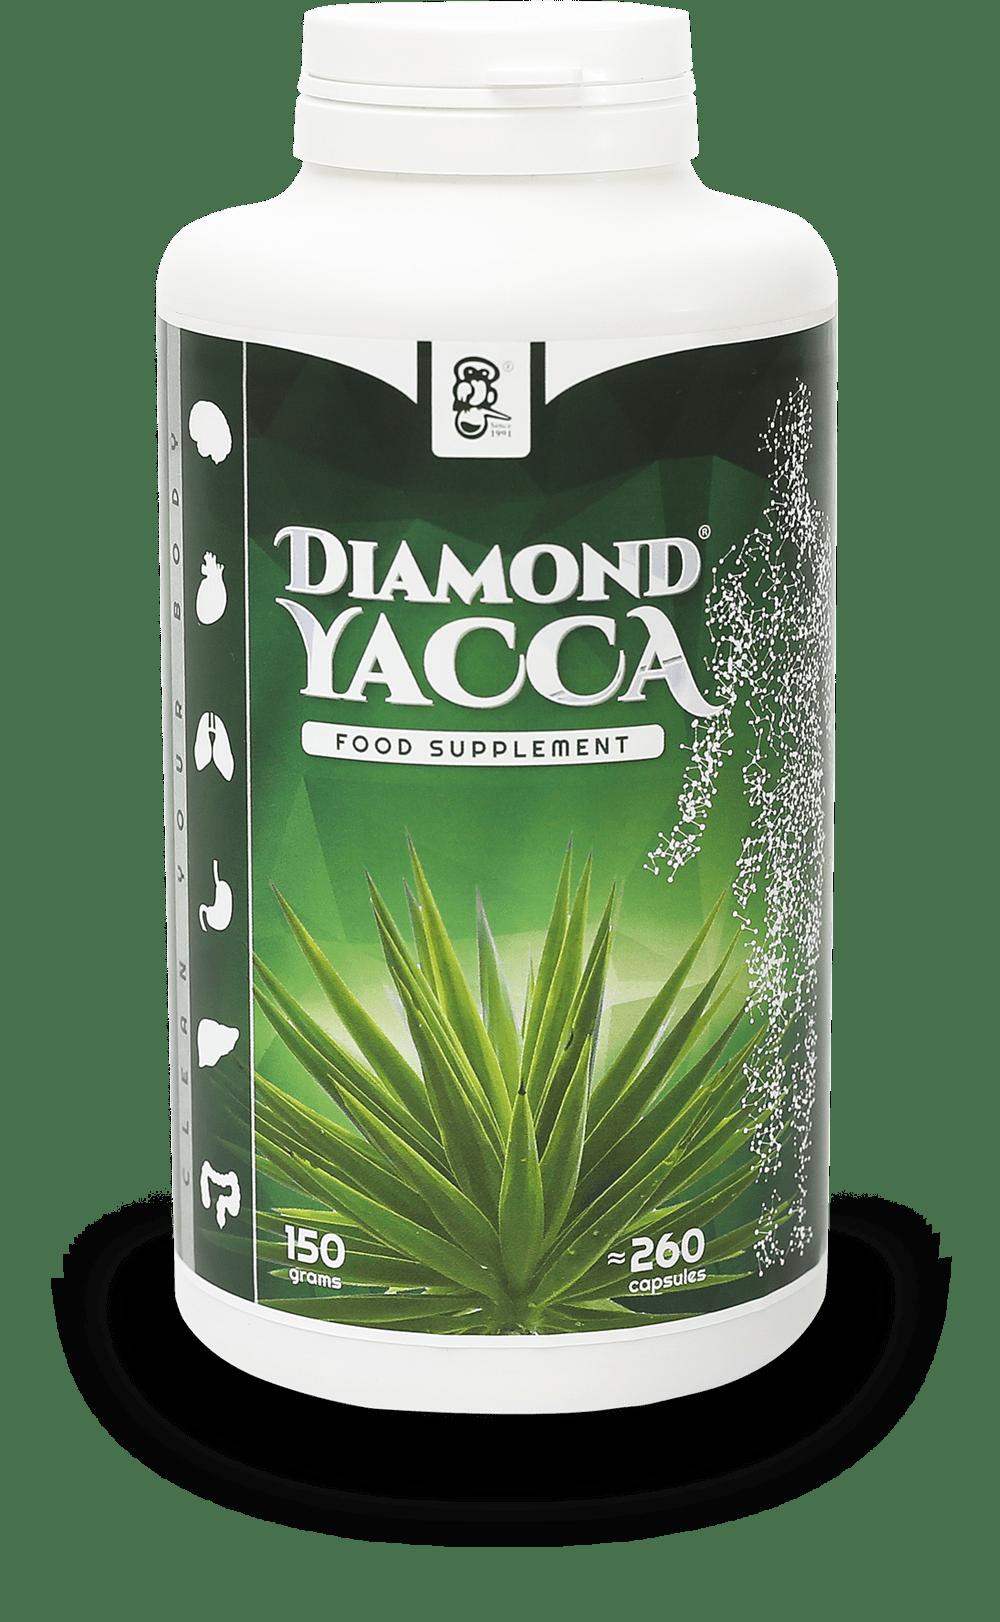 diamond-yacca-food-supplement-big